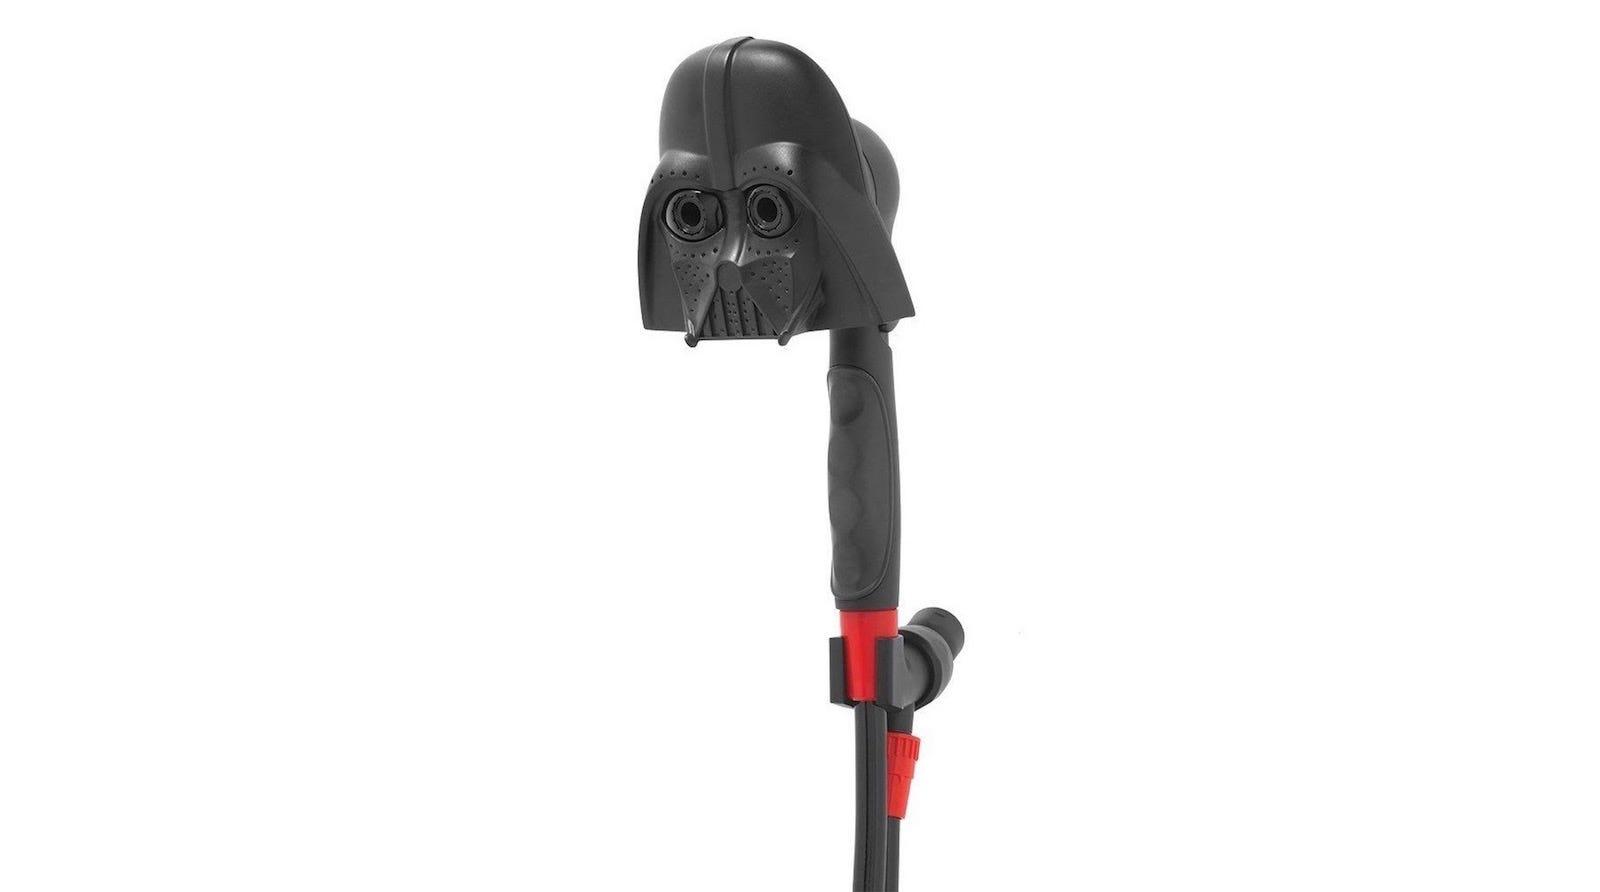 Oxygenics Darth Vader shower head.